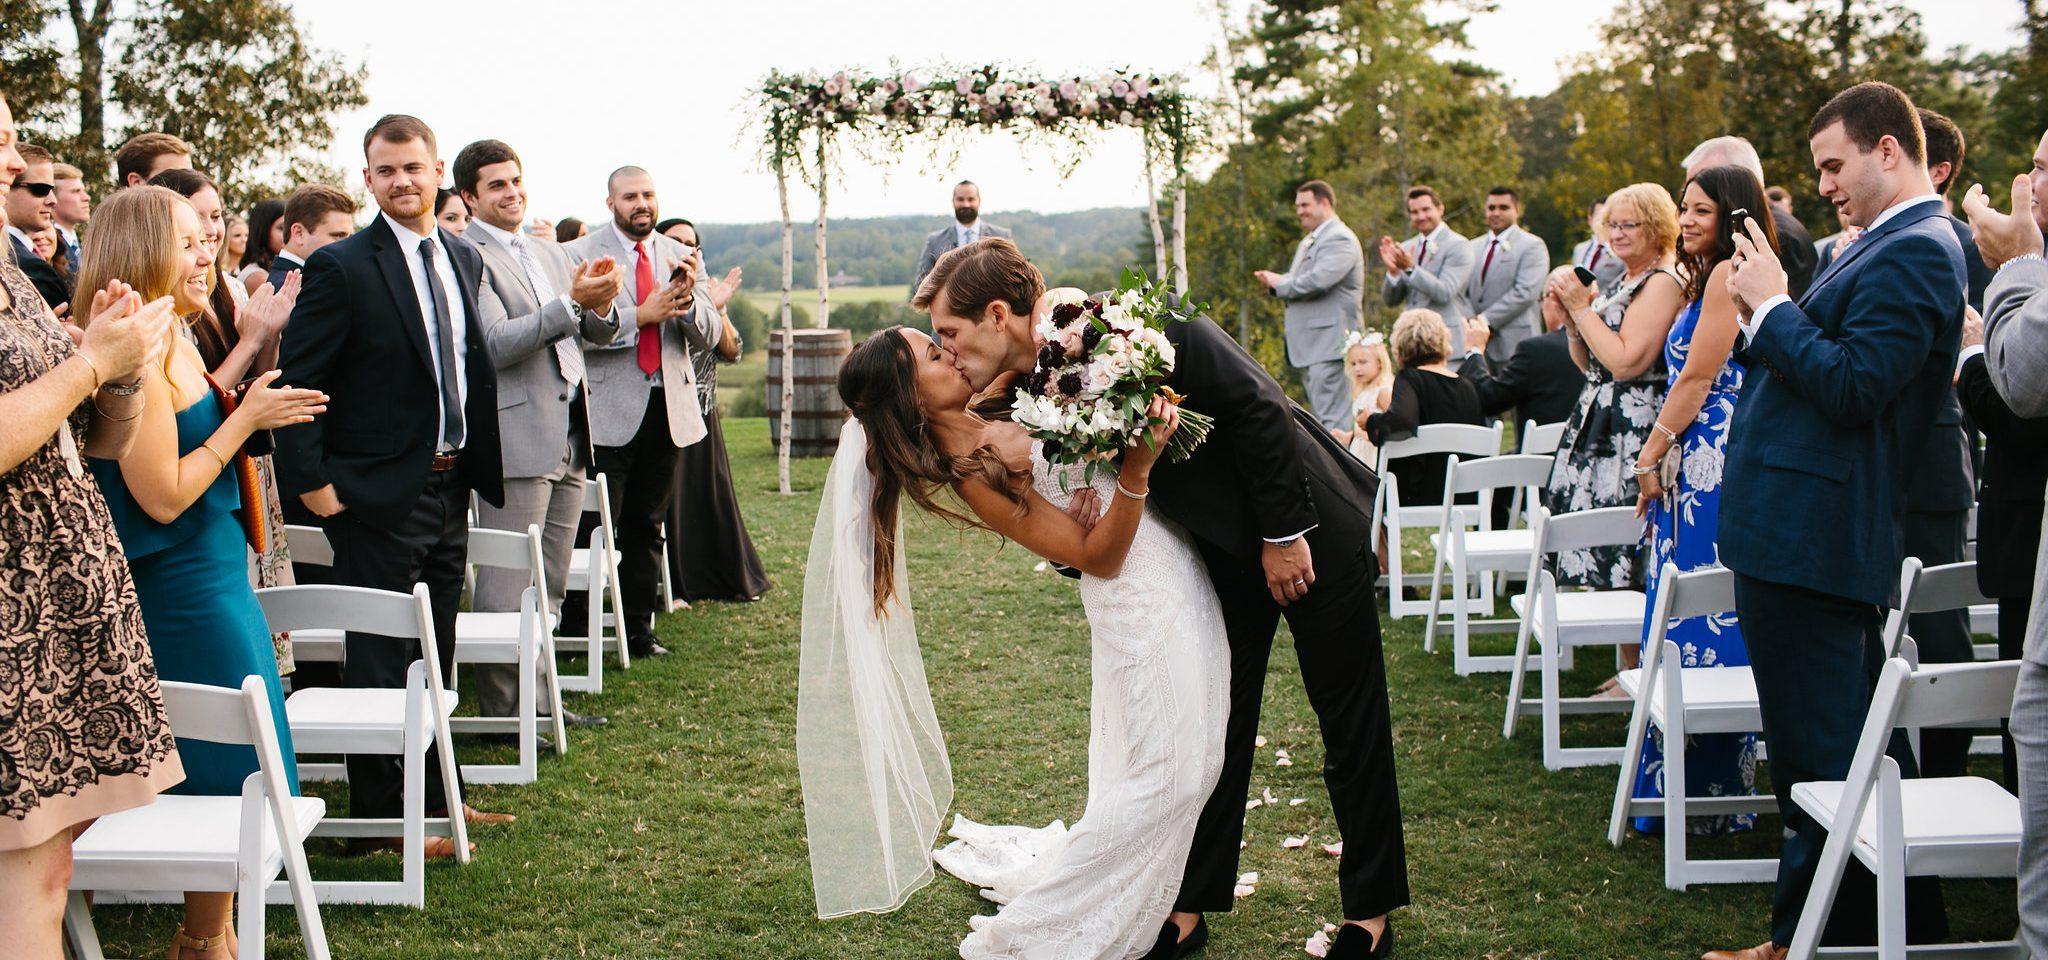 couple leaving ceremony kissing romantic wedding photos